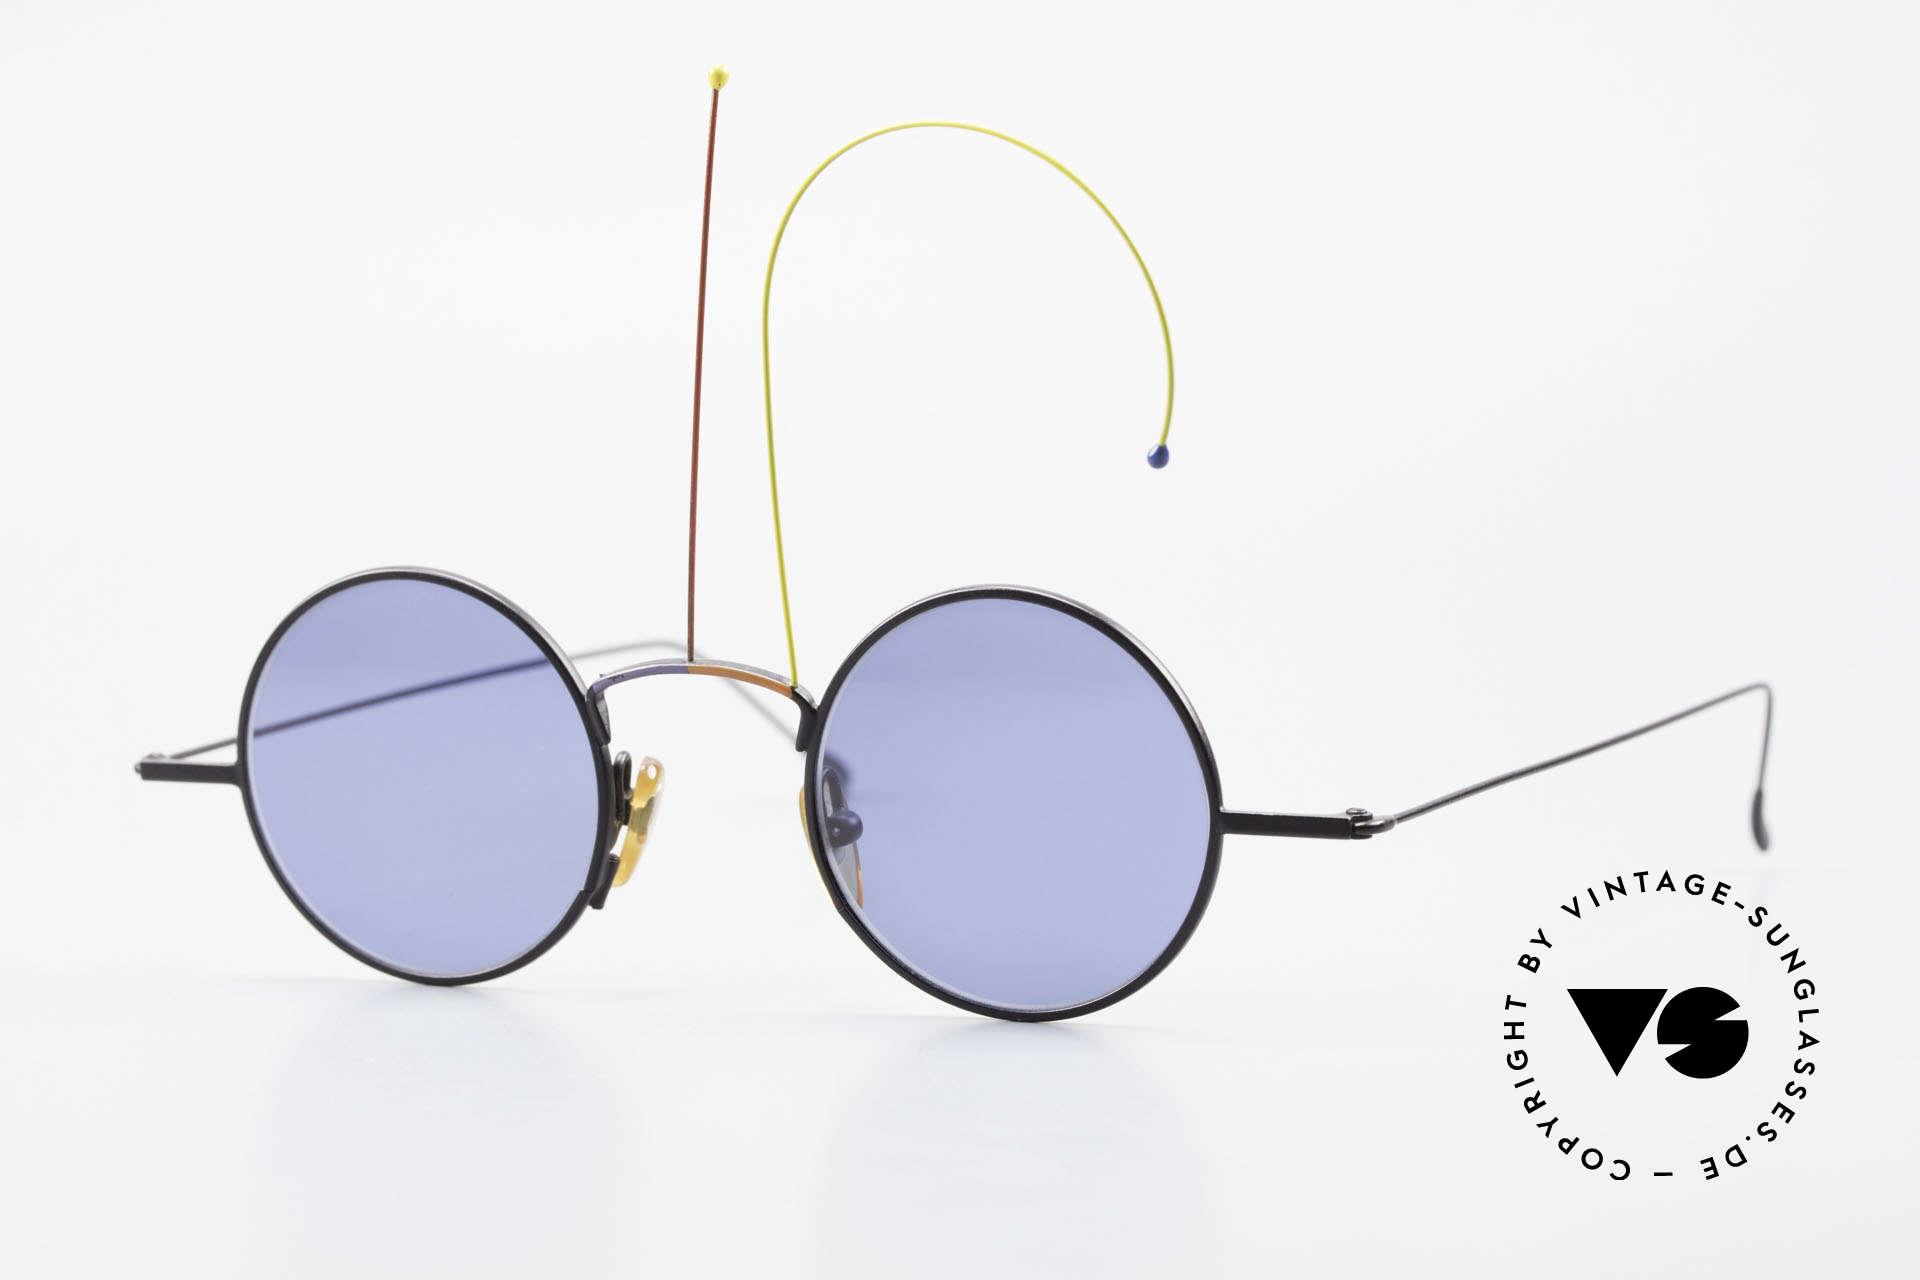 Casanova Arché 3 Limited Art Sunglasses 80's, glamorous CASANOVA sunglasses from around 1985/86, Made for Men and Women